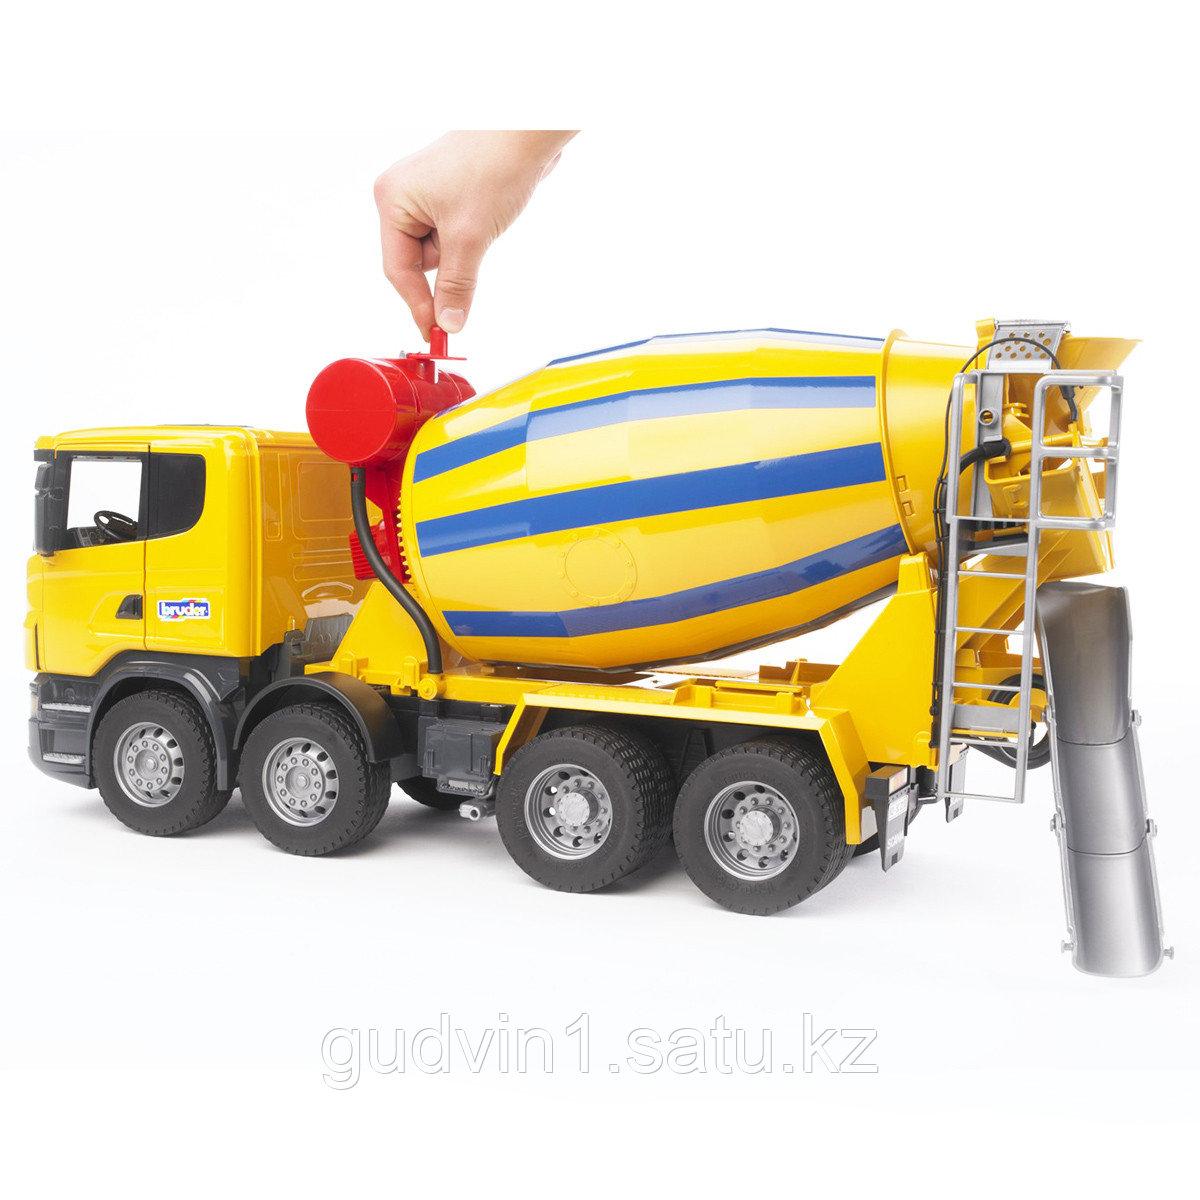 Бетономешалка Scania  Bruder 03-554